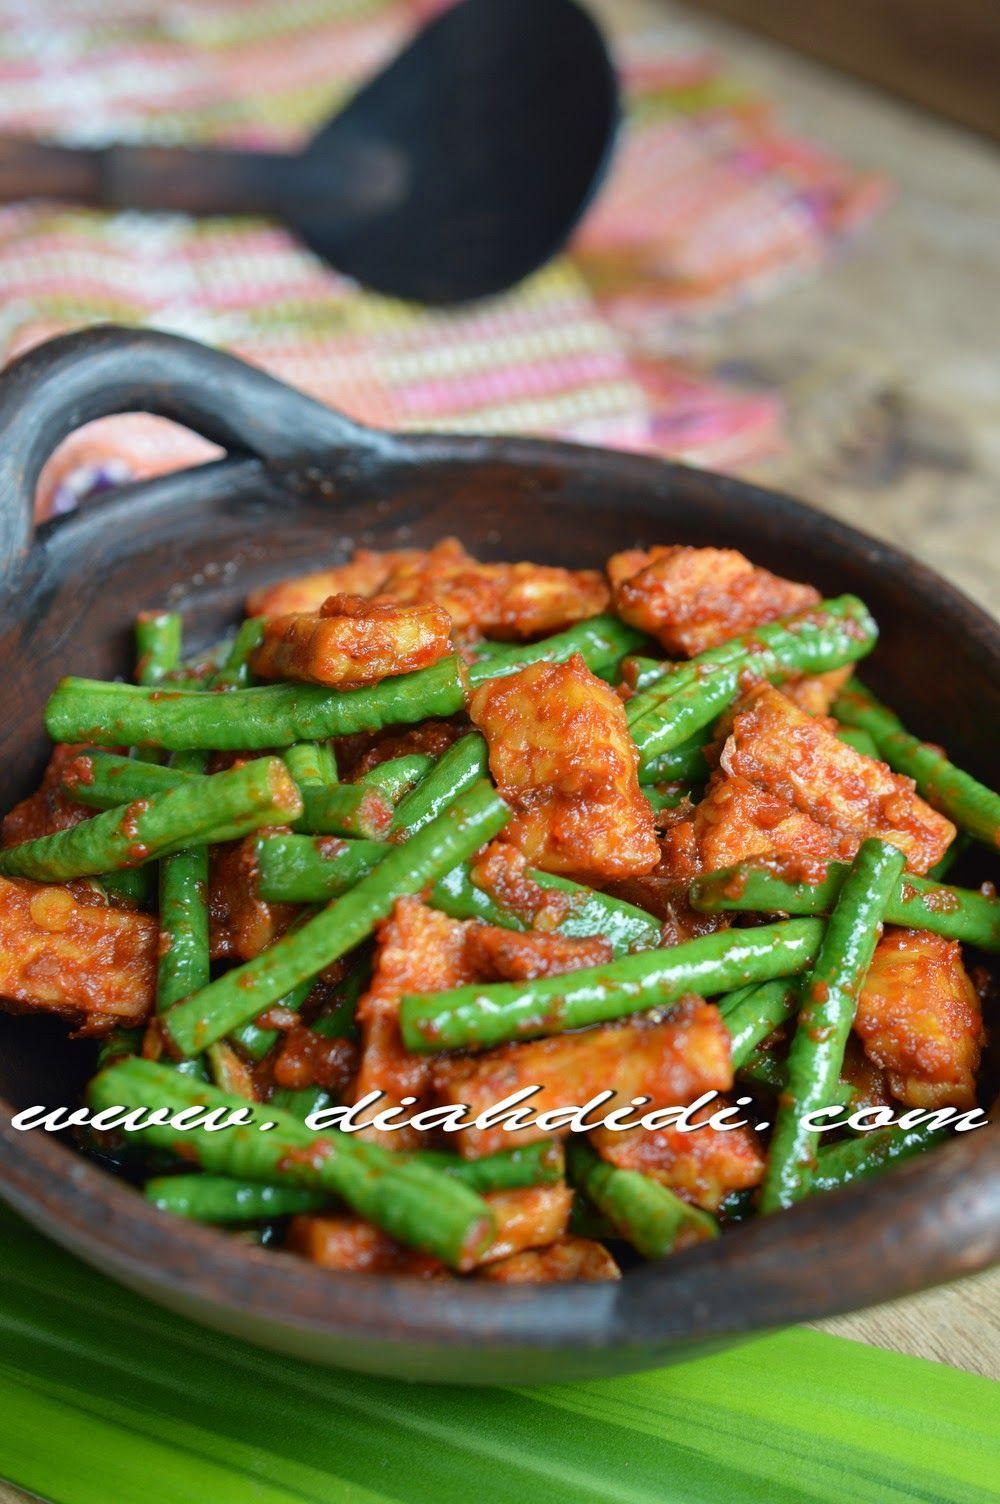 Diah Didi S Kitchen Tumis Kacang Panjang Tempe Bumbu Ulek Resep Masakan Makanan Dan Minuman Tumis